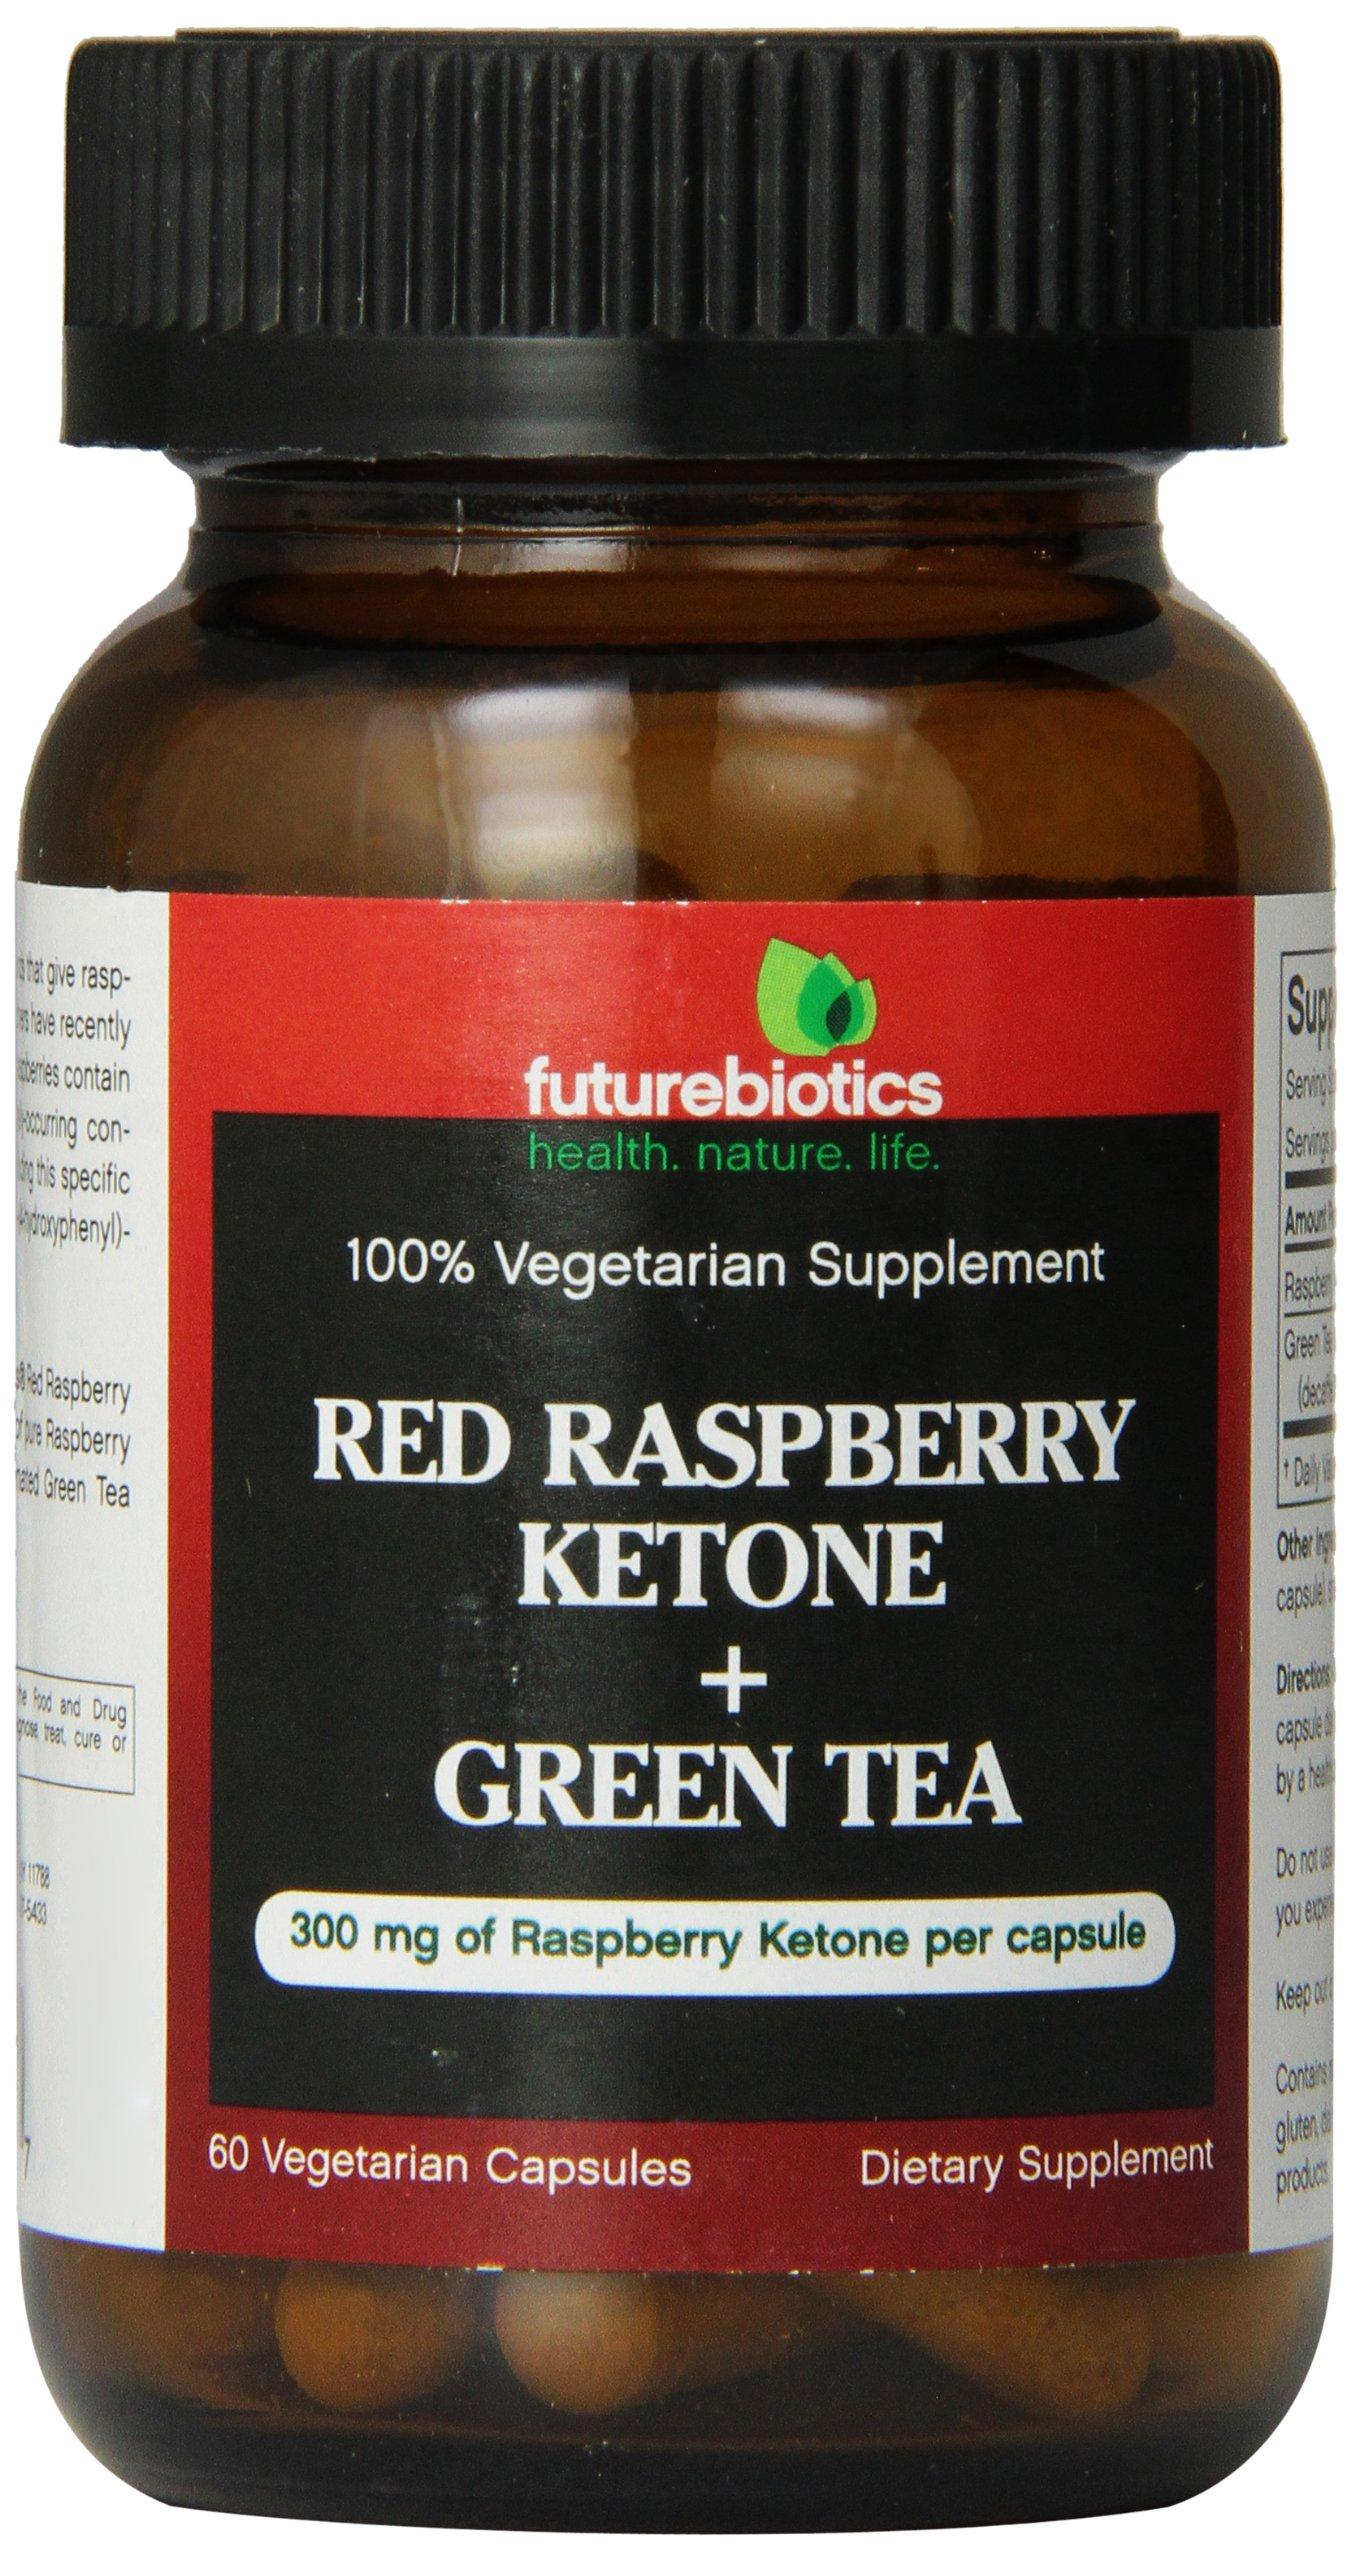 Futurebiotics Red Rasberry Ketone + Green Tea, 60 Vegetarian Capsules